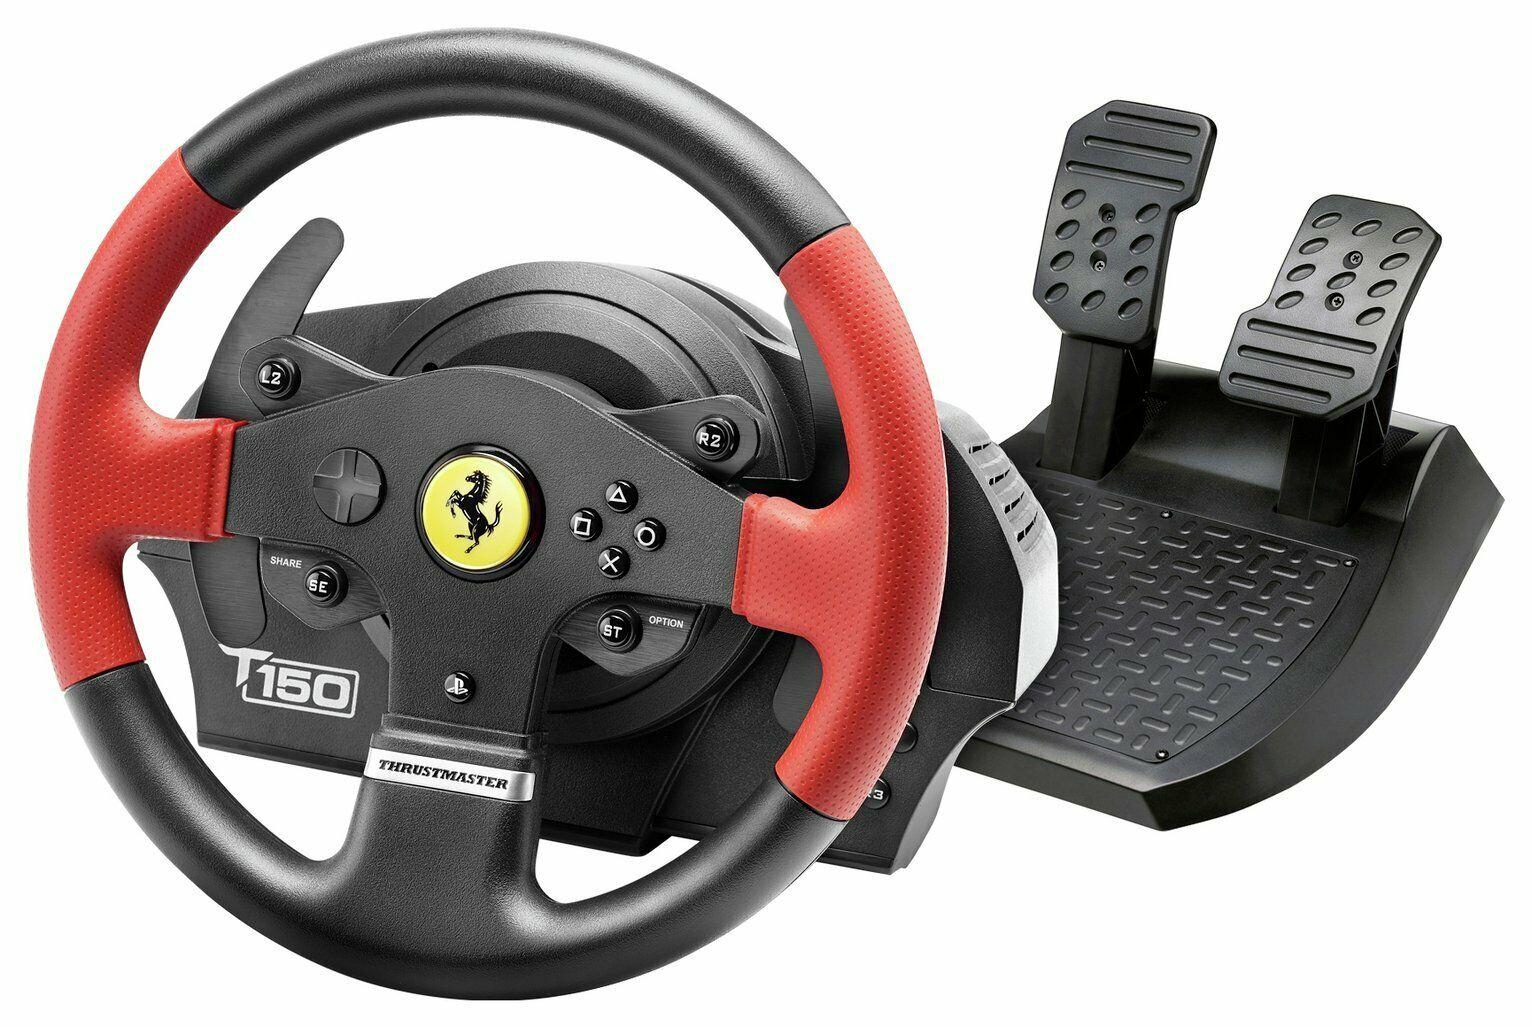 Thrustmaster T150 Ferrari Edition Racing Wheel for Sony Playstation PS3/4/5 - £124.99 delivered @ Argos / eBay